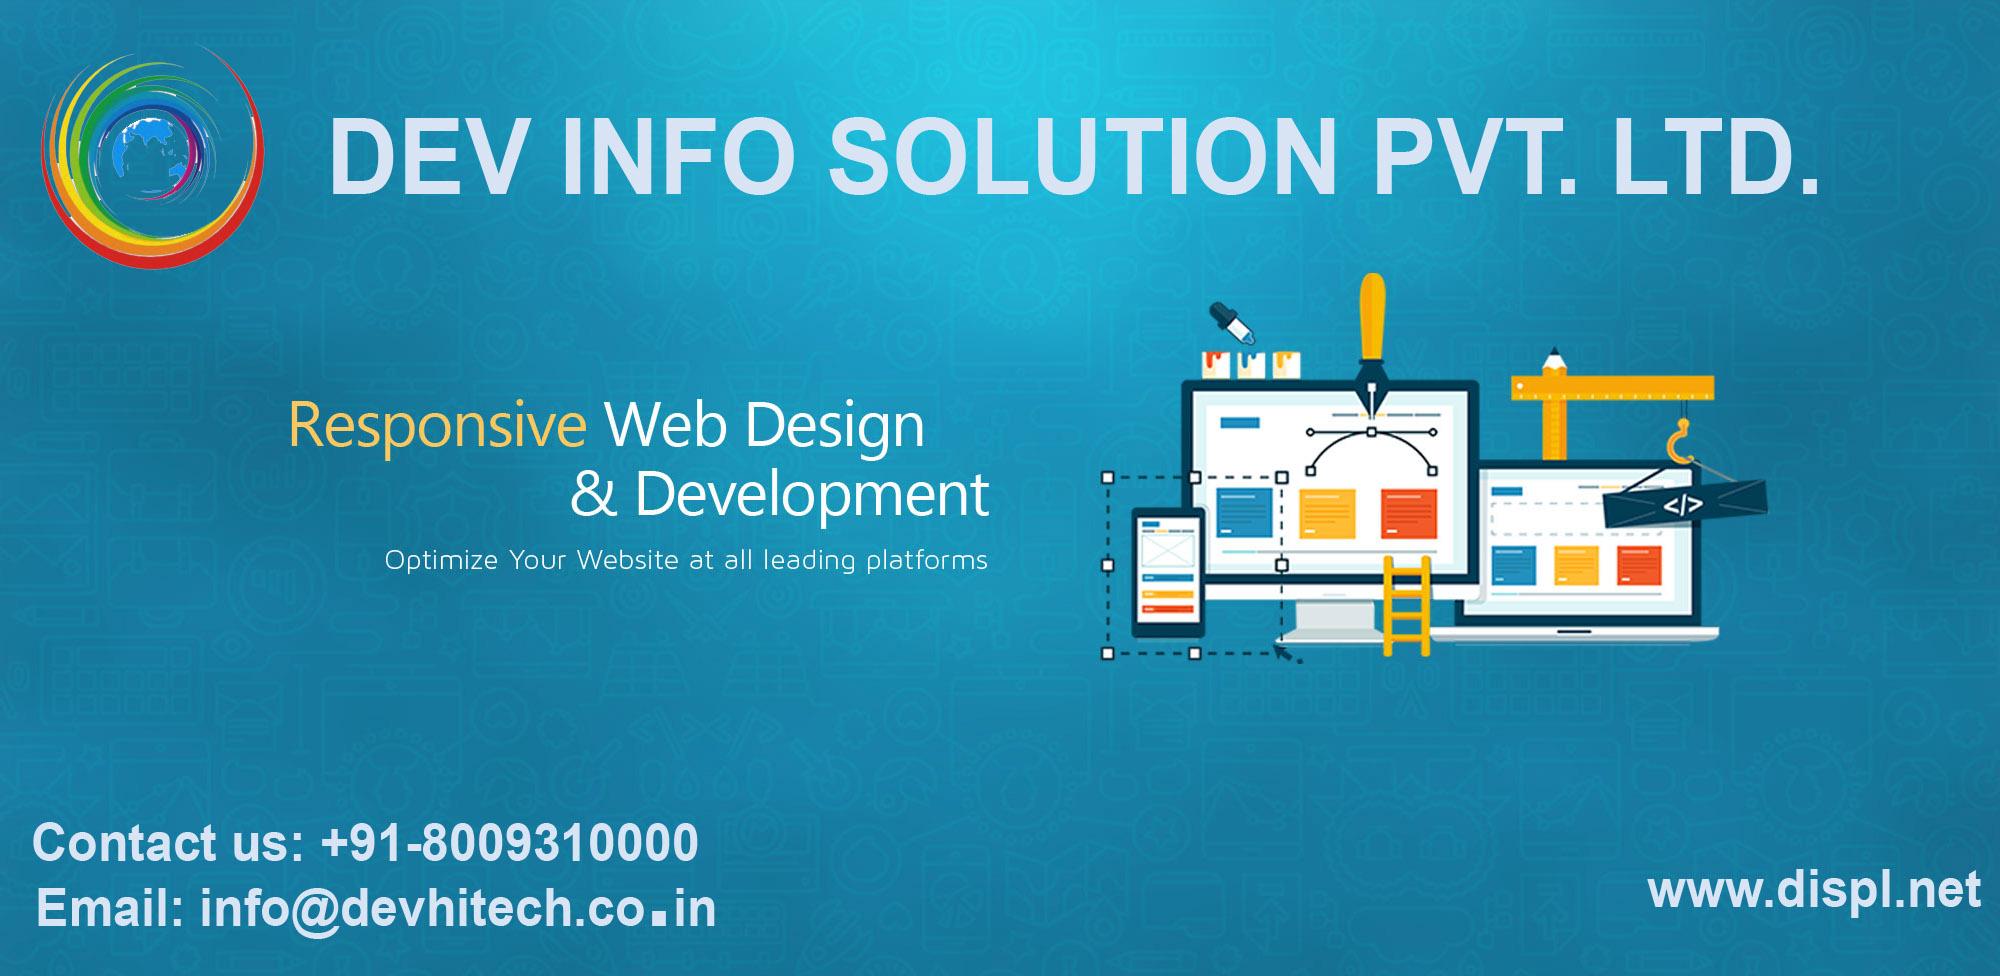 Dev Info Solution Pvt Ltd